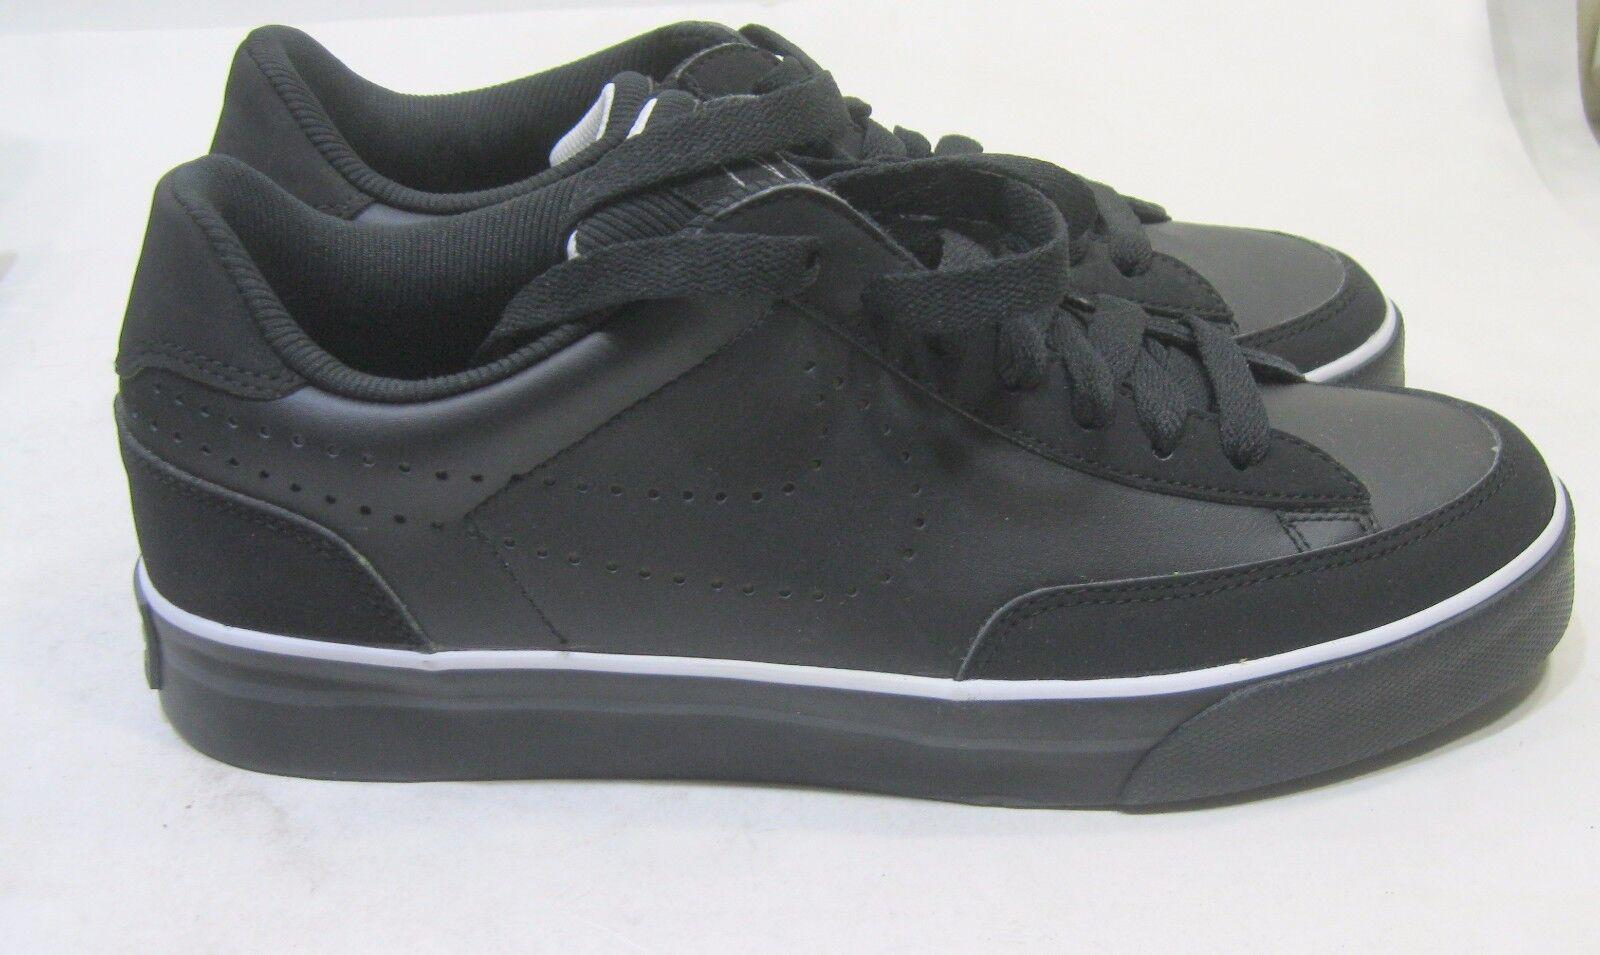 Nike Navaro Basse Nero/black-anthracite-white 386587 001 TAGLIA 9